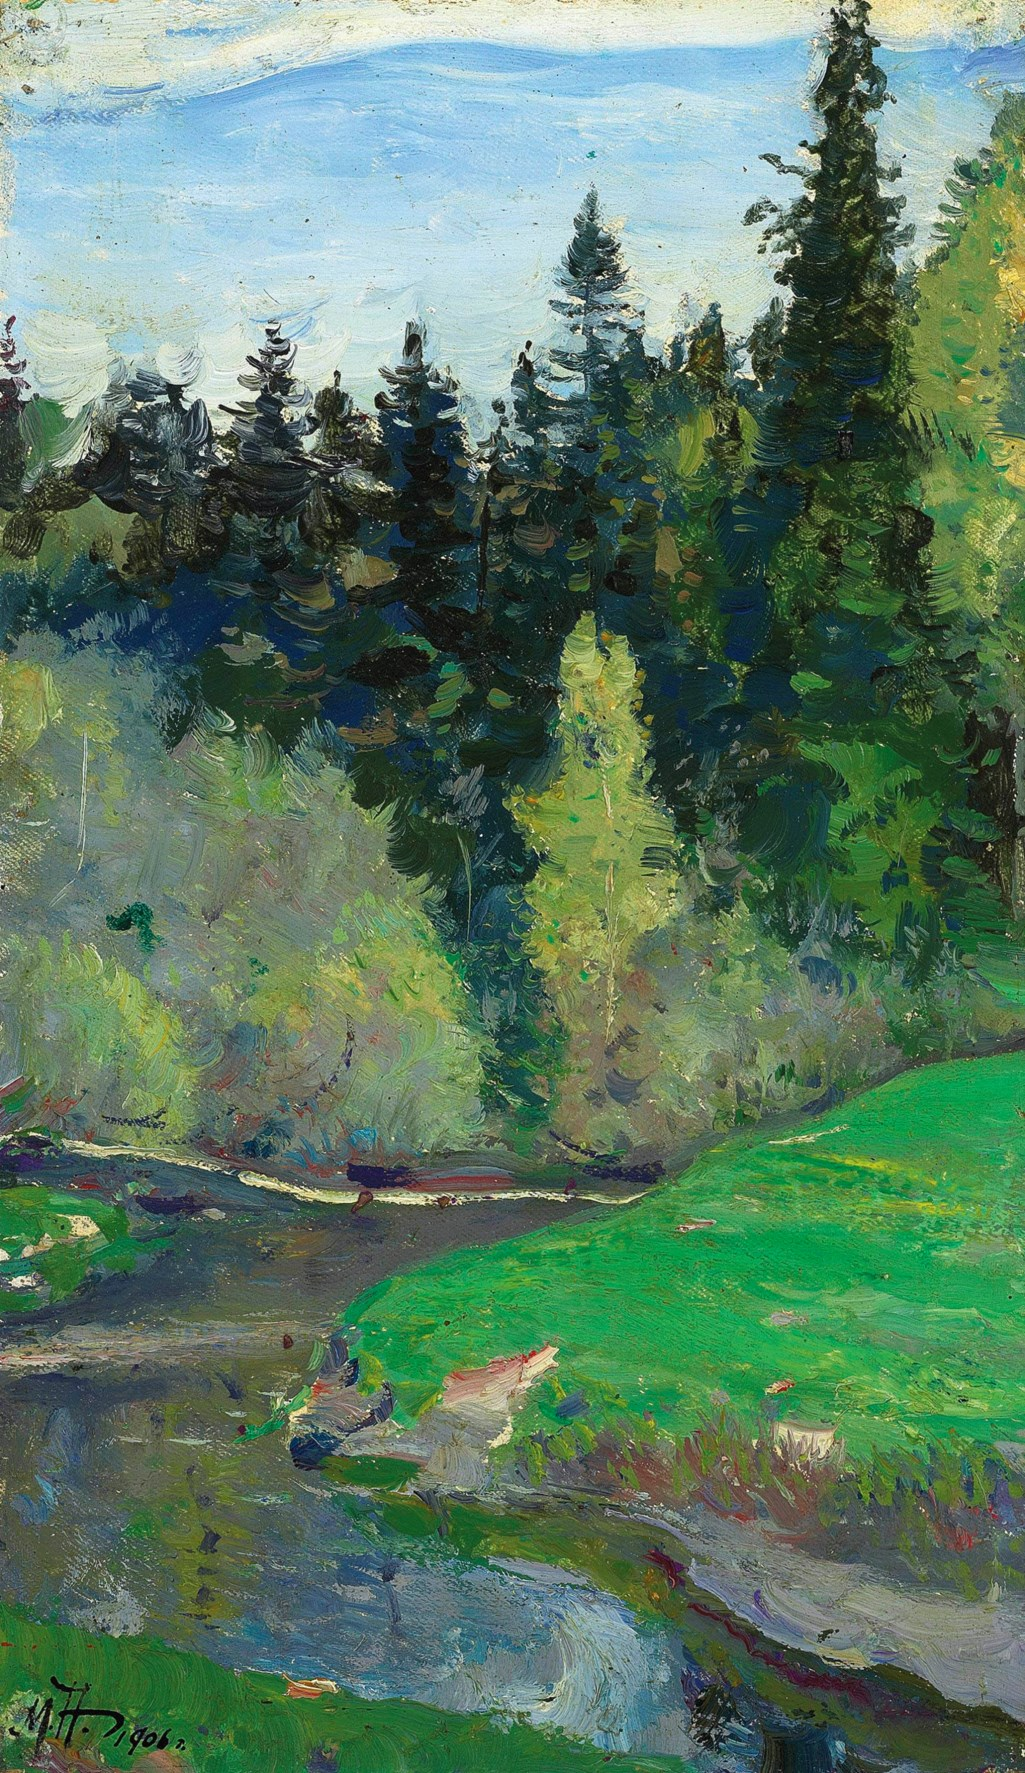 Mikhail Nesterov (1862-1942) Abramtsevo, the River Vori / Михаил Нестеров (1862-1942) Абрамцево, река Воря